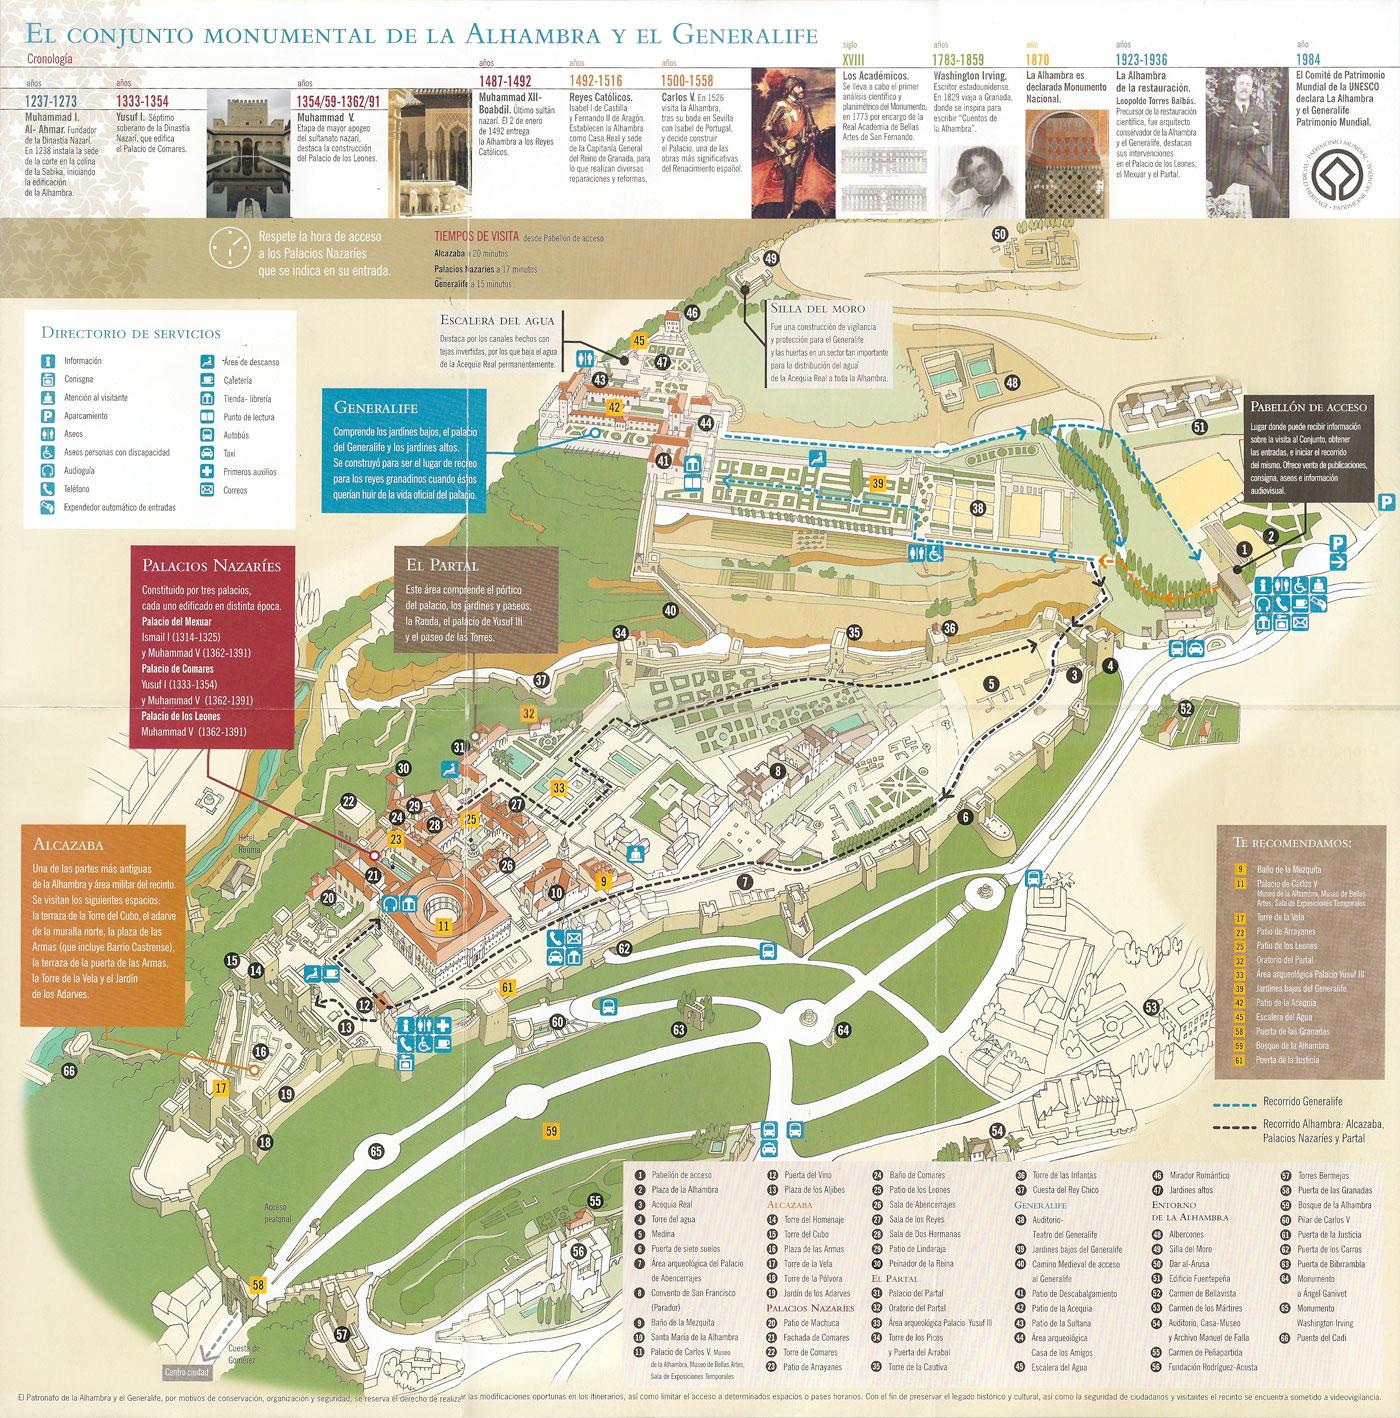 Map via alhambra.org